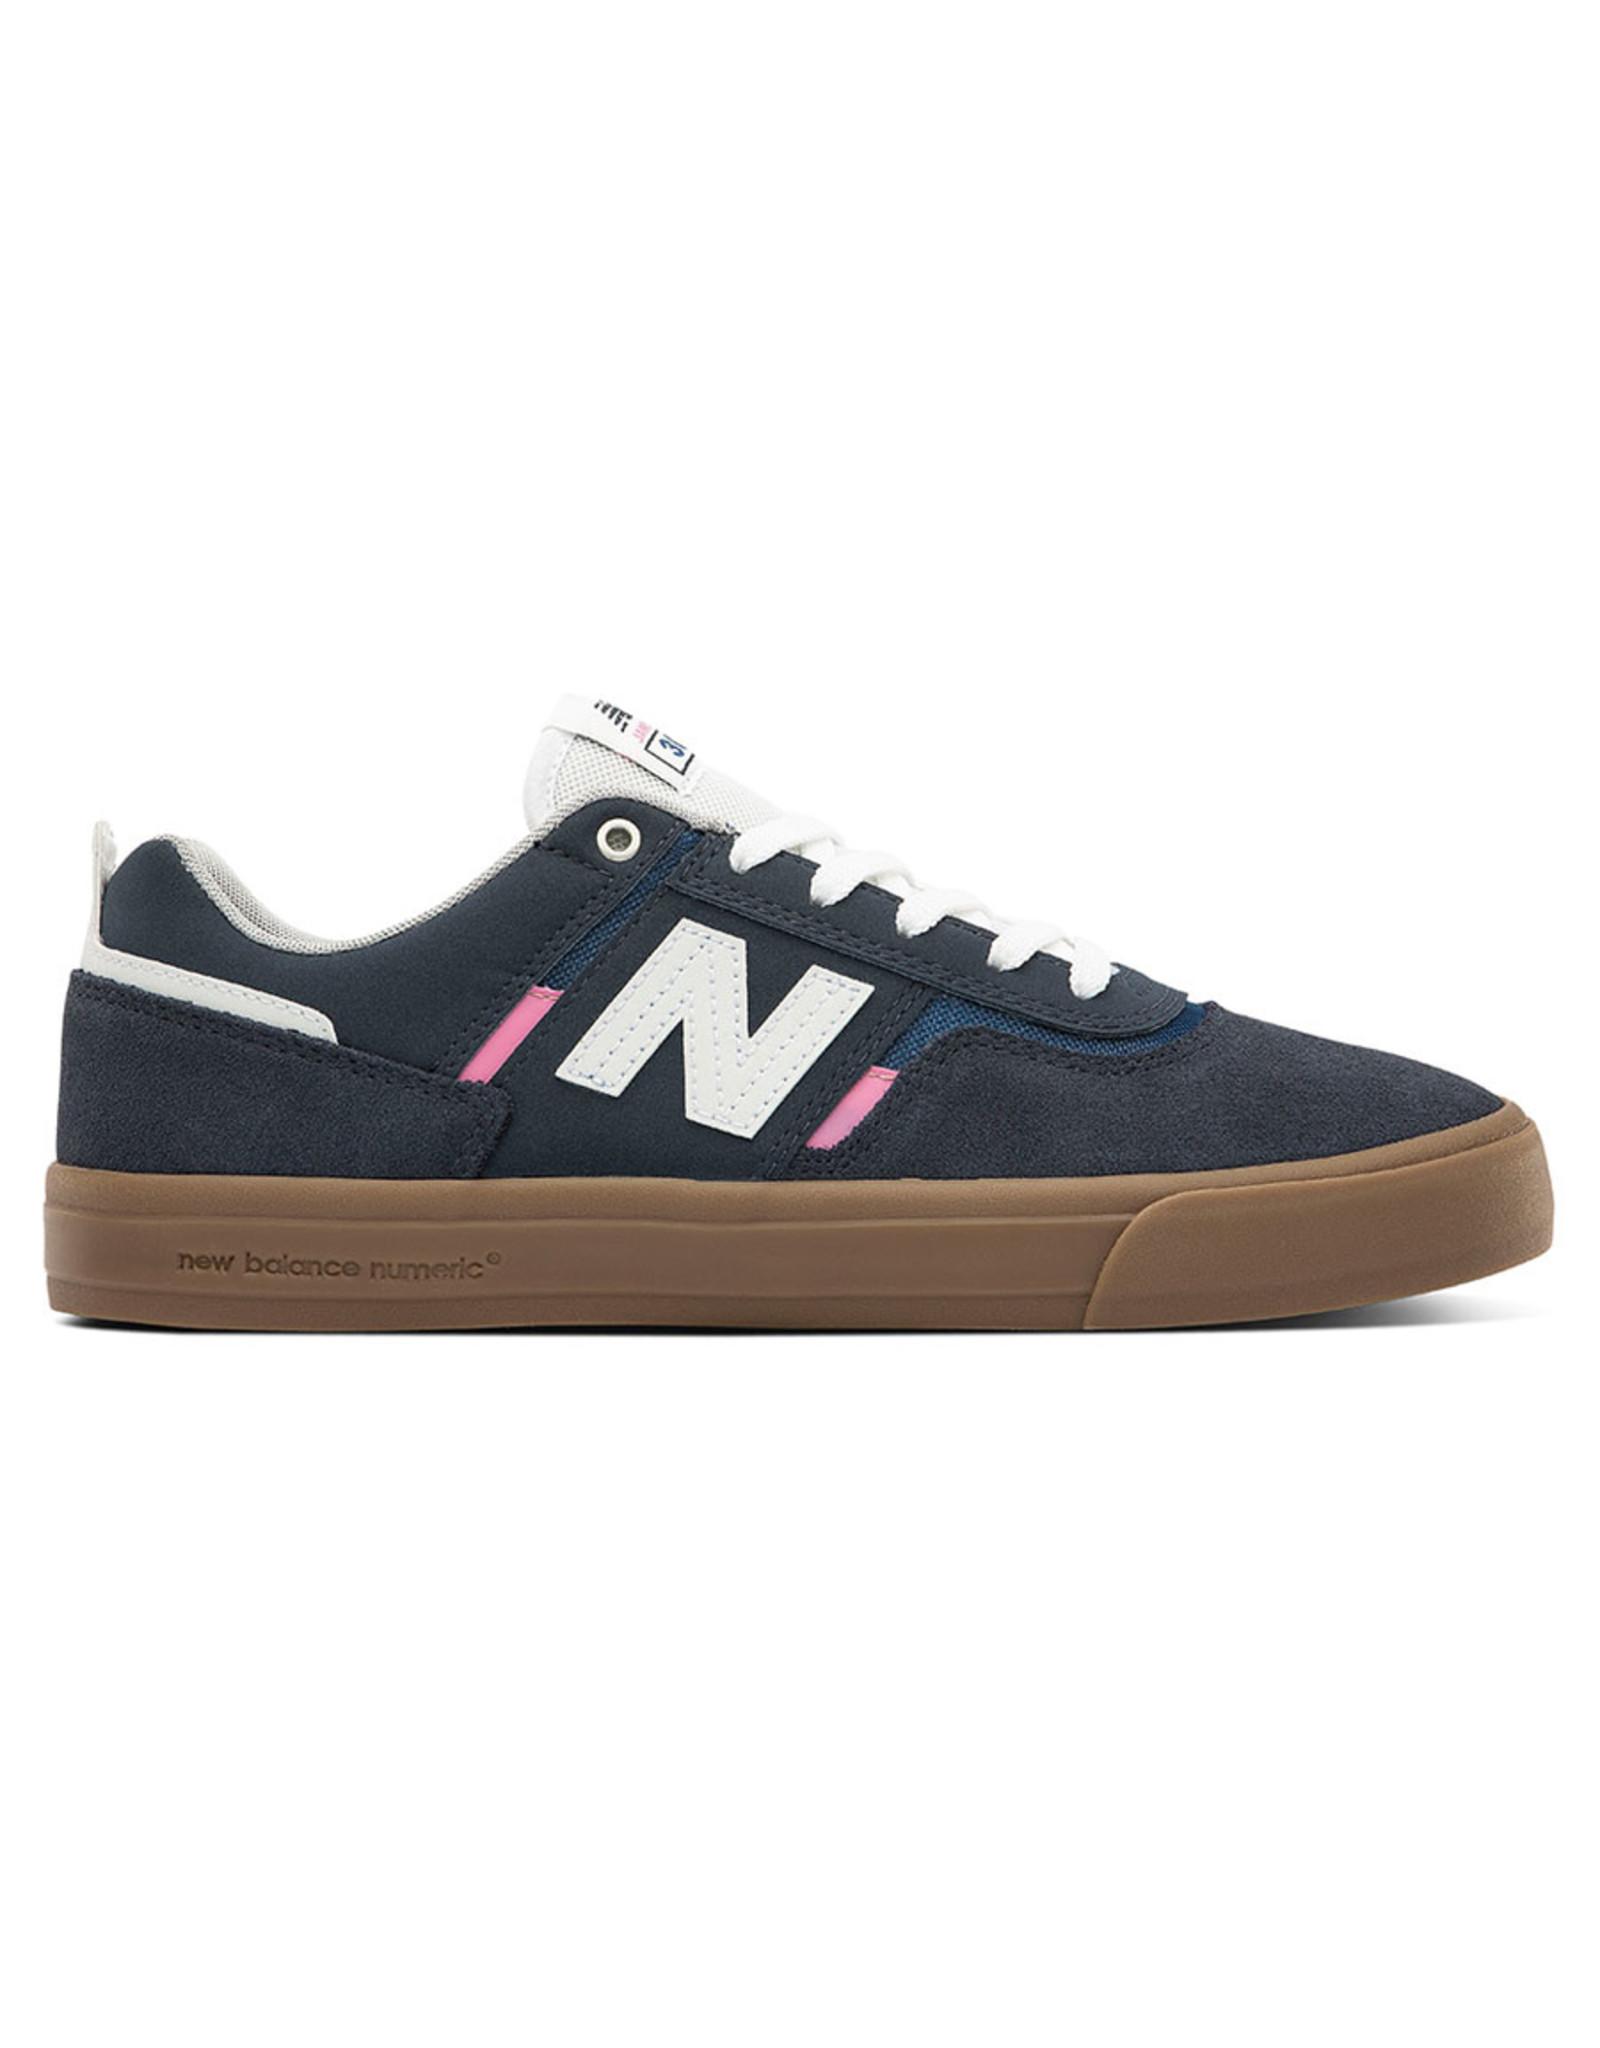 New Balance Numeric New Balance Numeric Shoe 306 Jamie Foy (Navy/Pink/Gum)